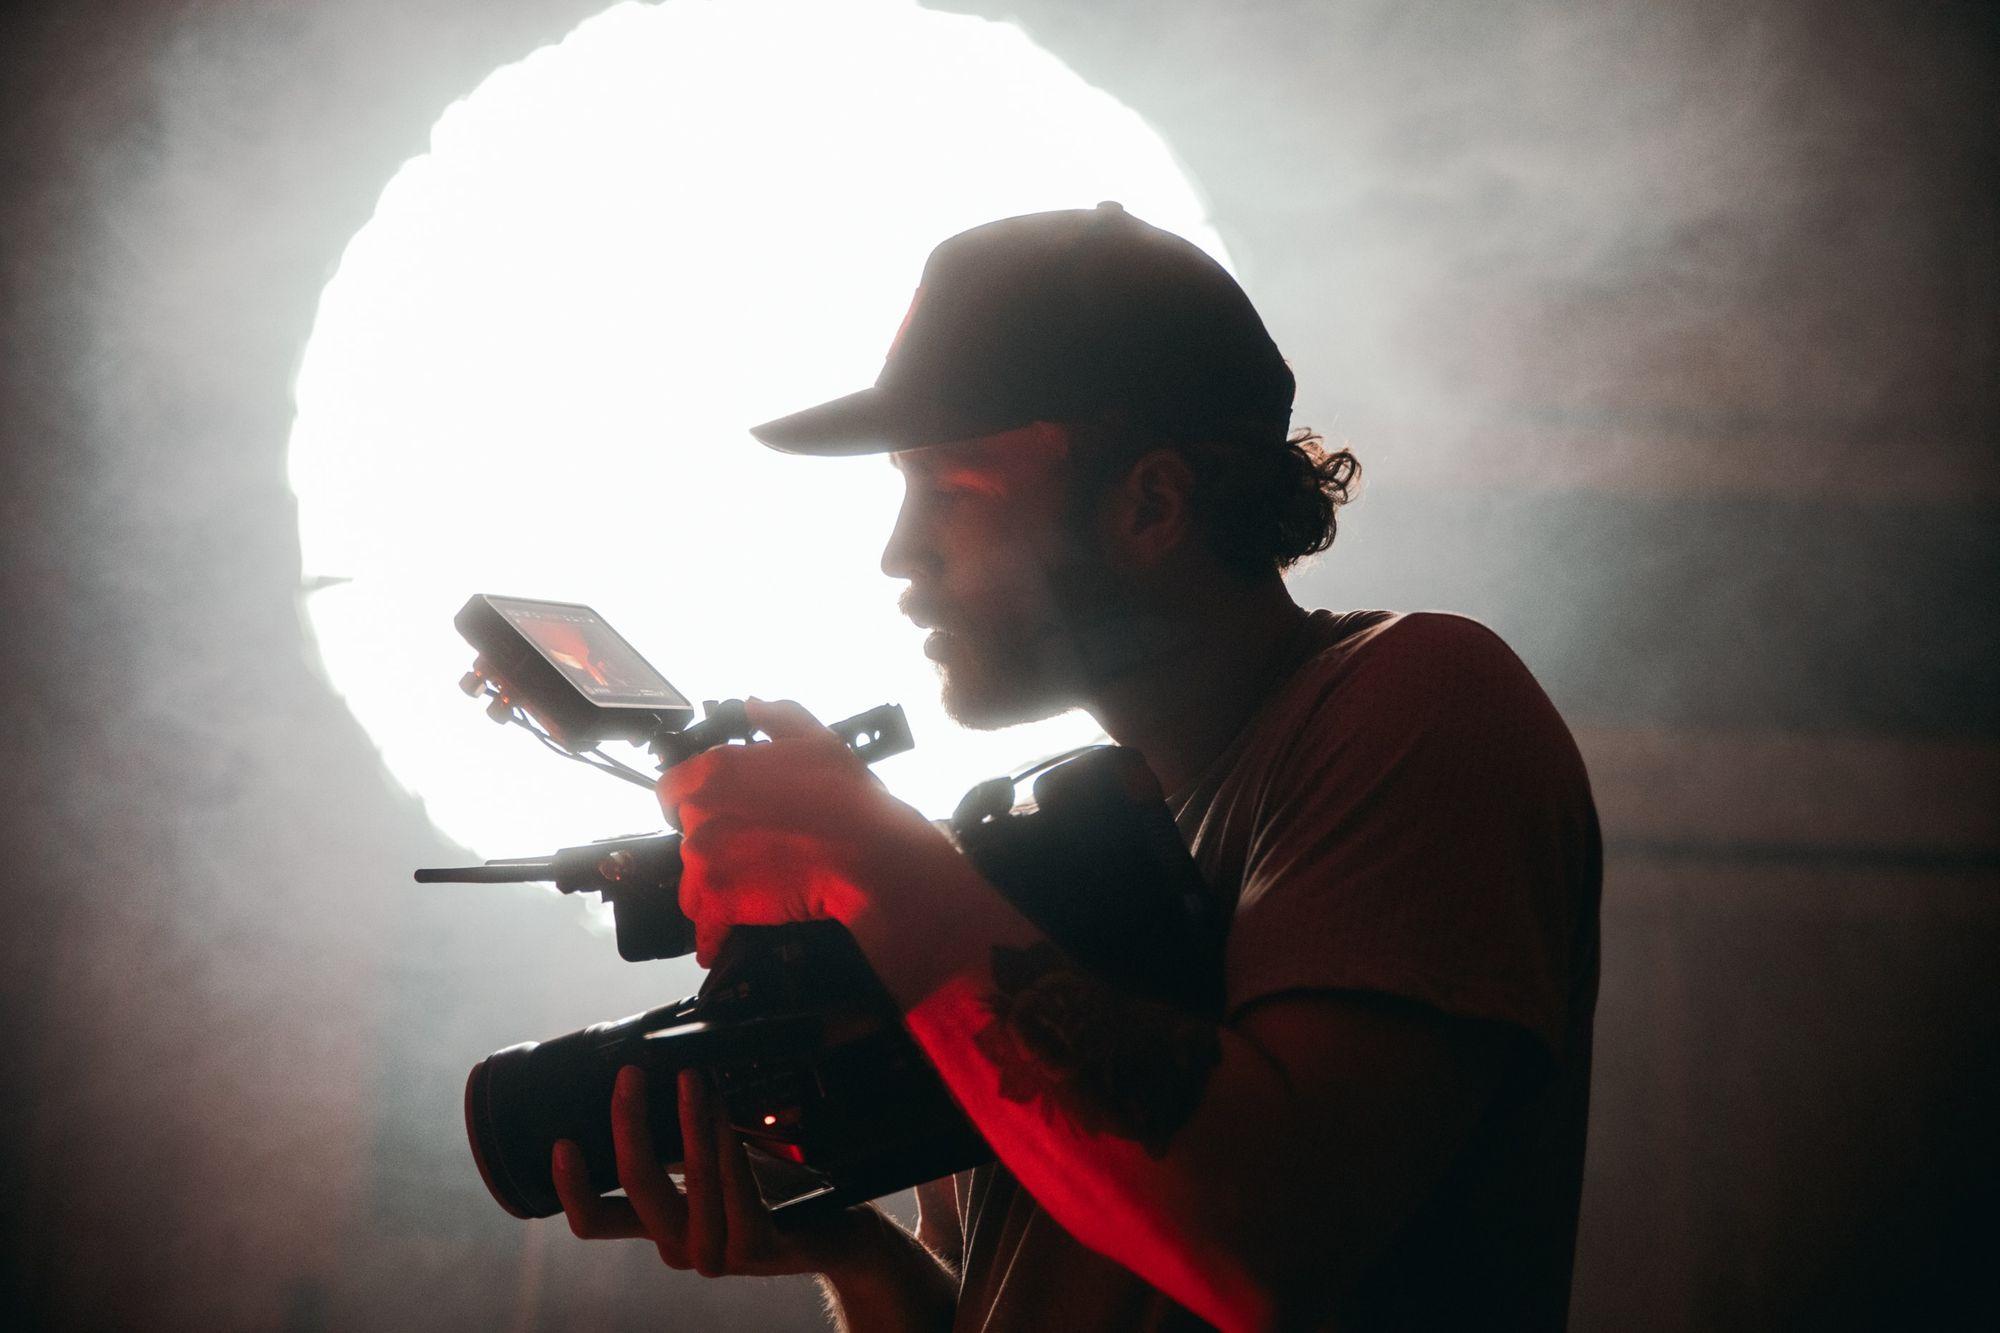 Hard cinematic lighting - good for film noirs